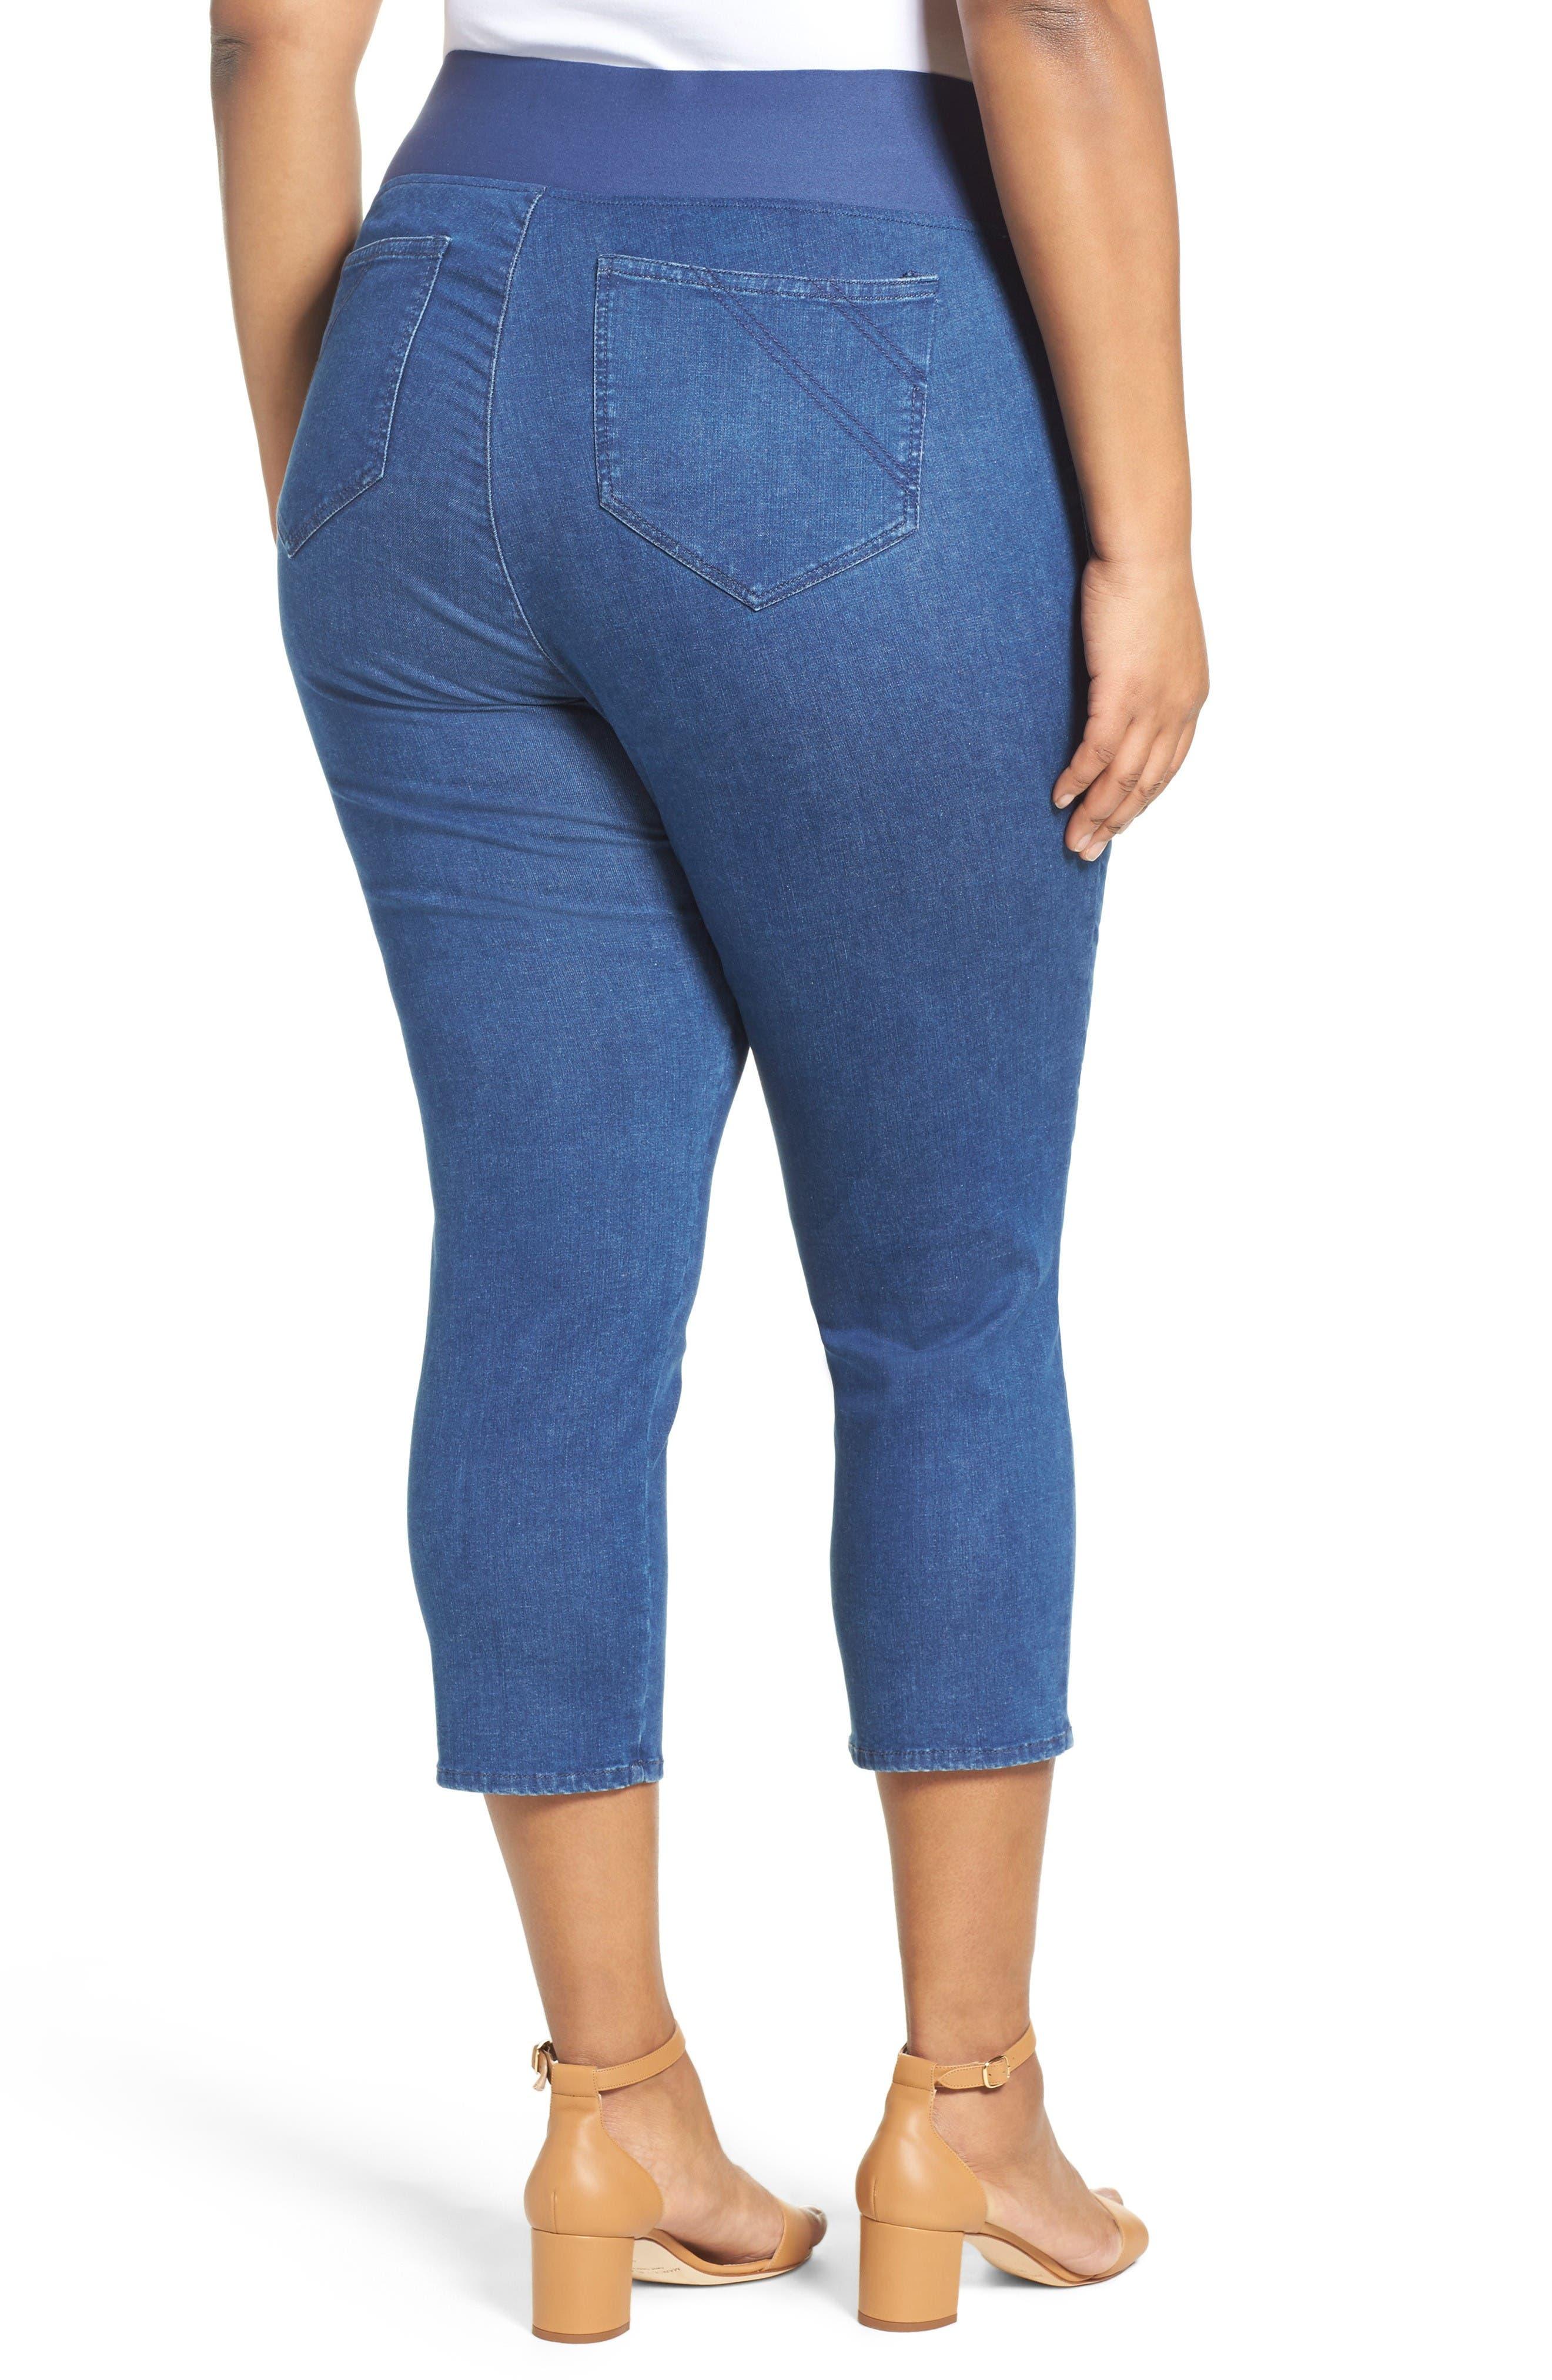 Alternate Image 2  - Foxcroft Nina Slimming Pull-On Capri Jeans (Plus Size)